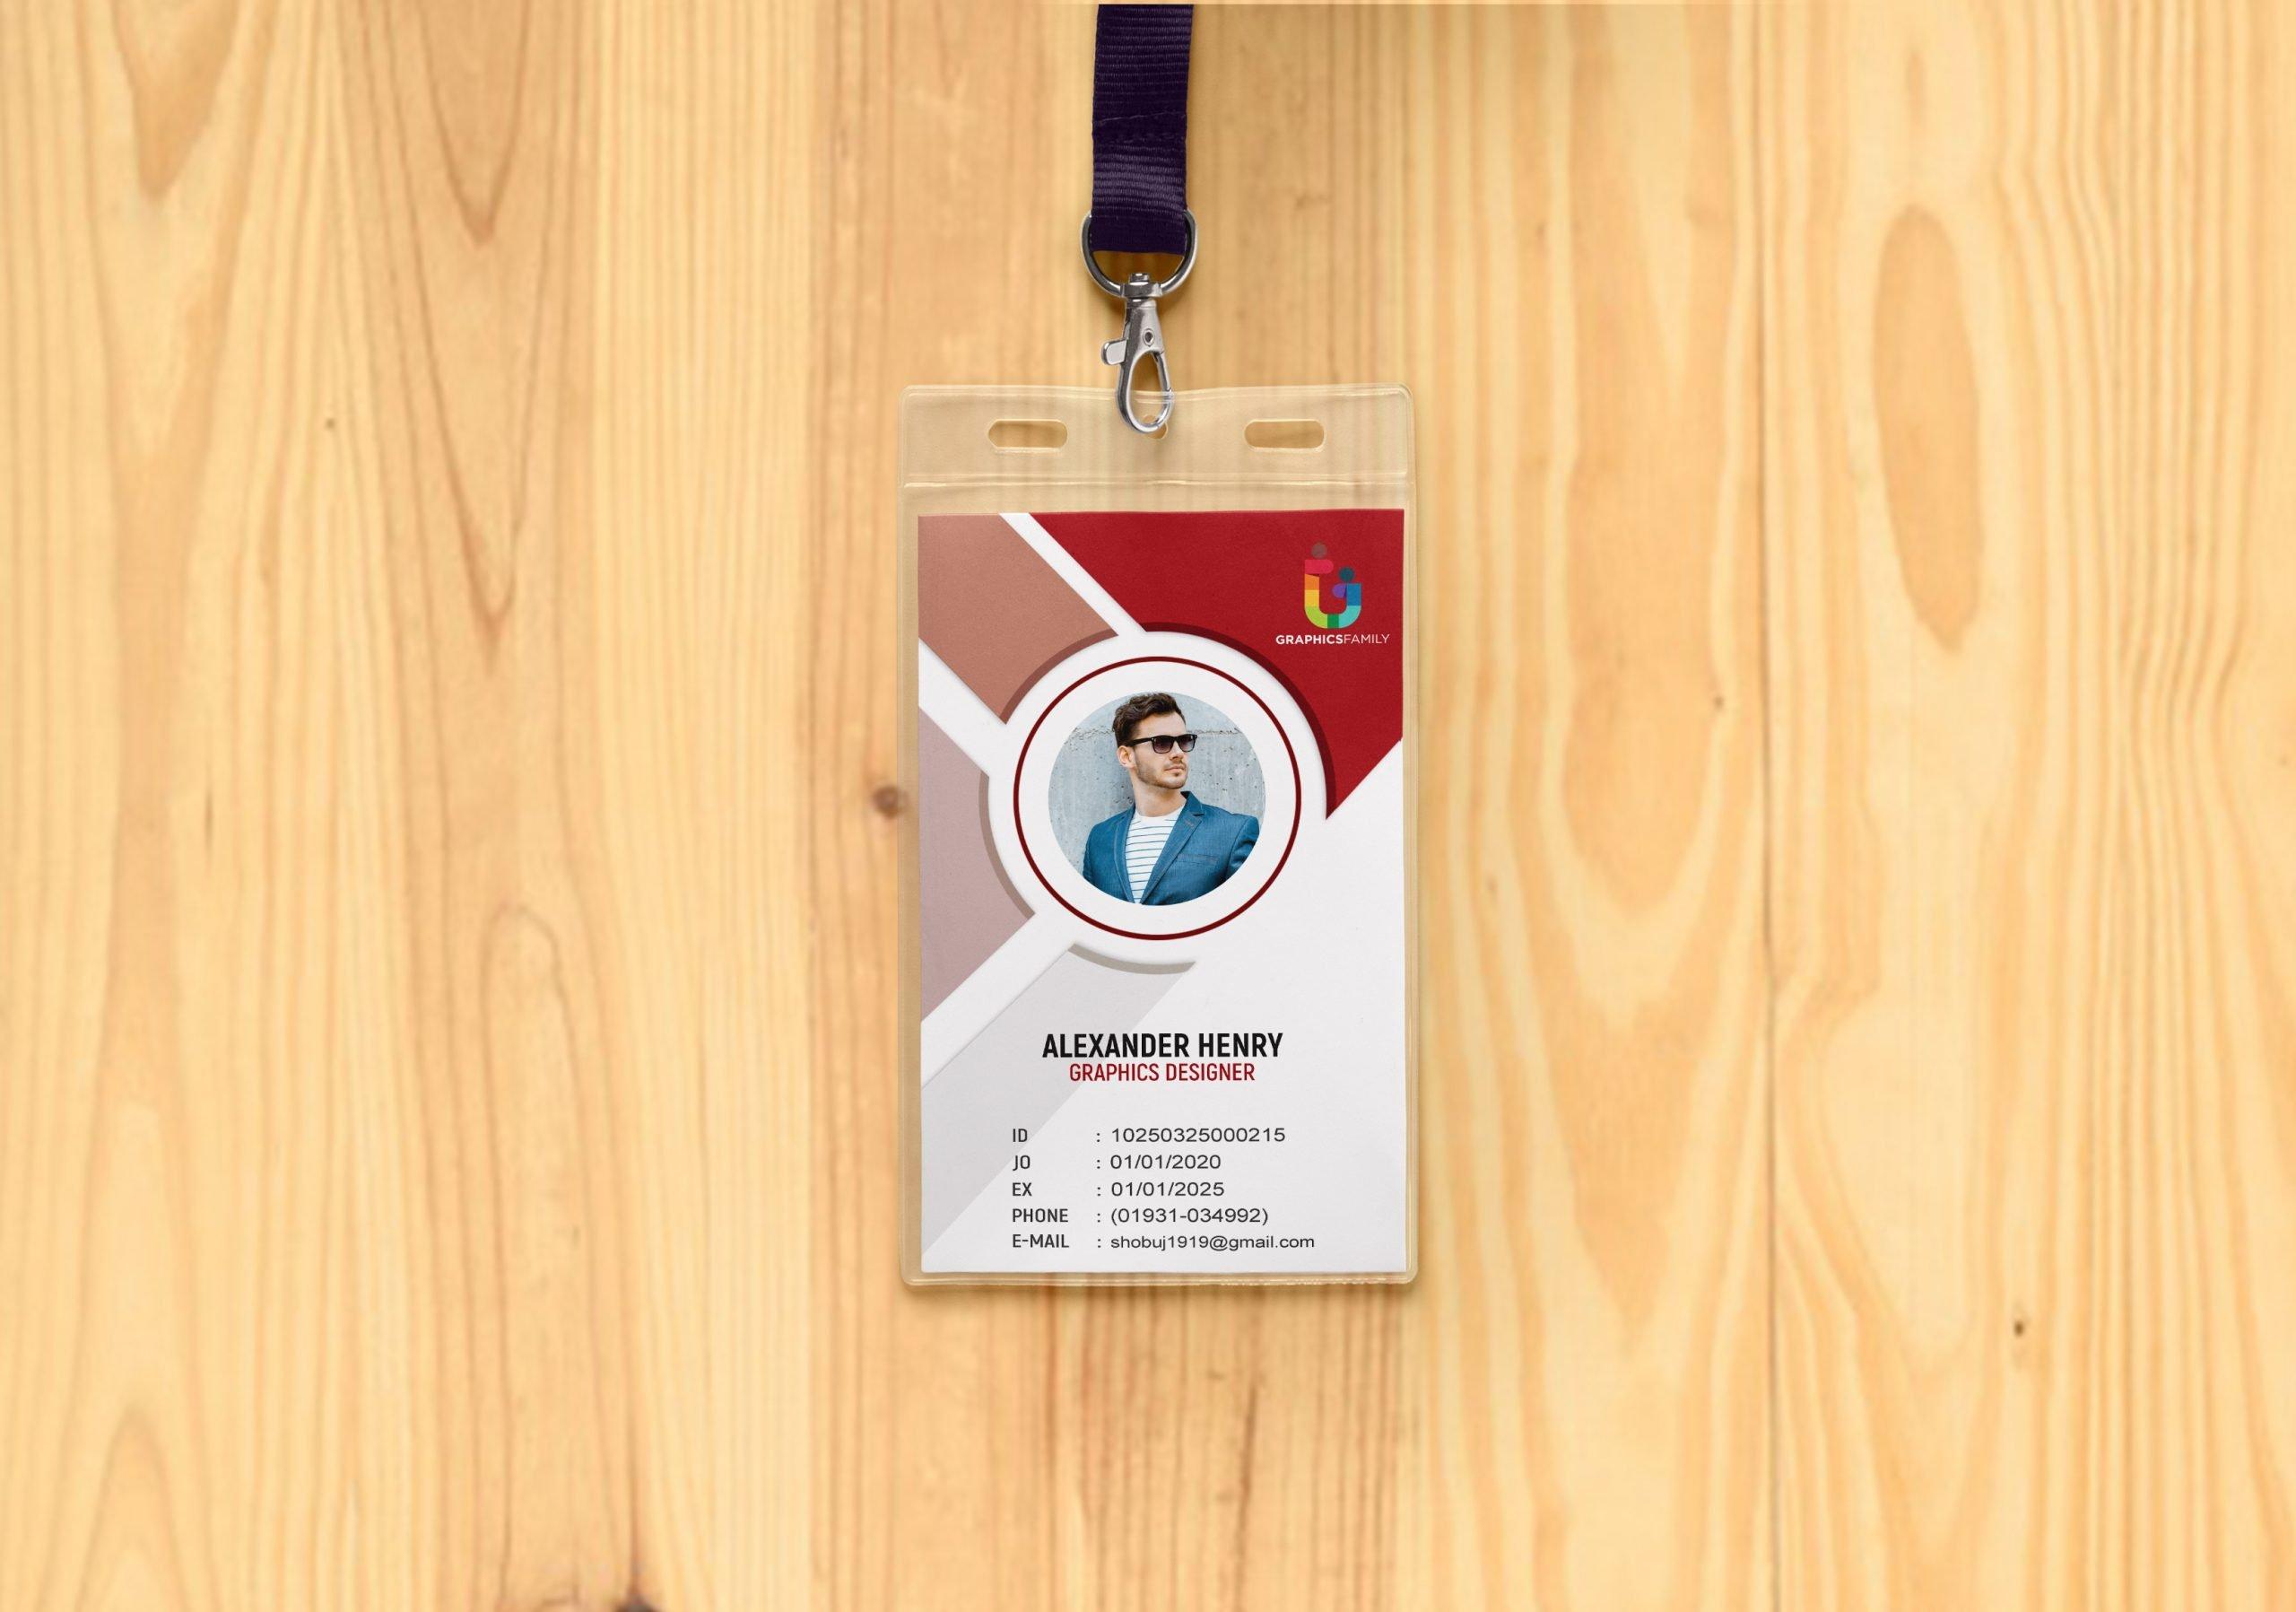 id card design with wood mockup presentation